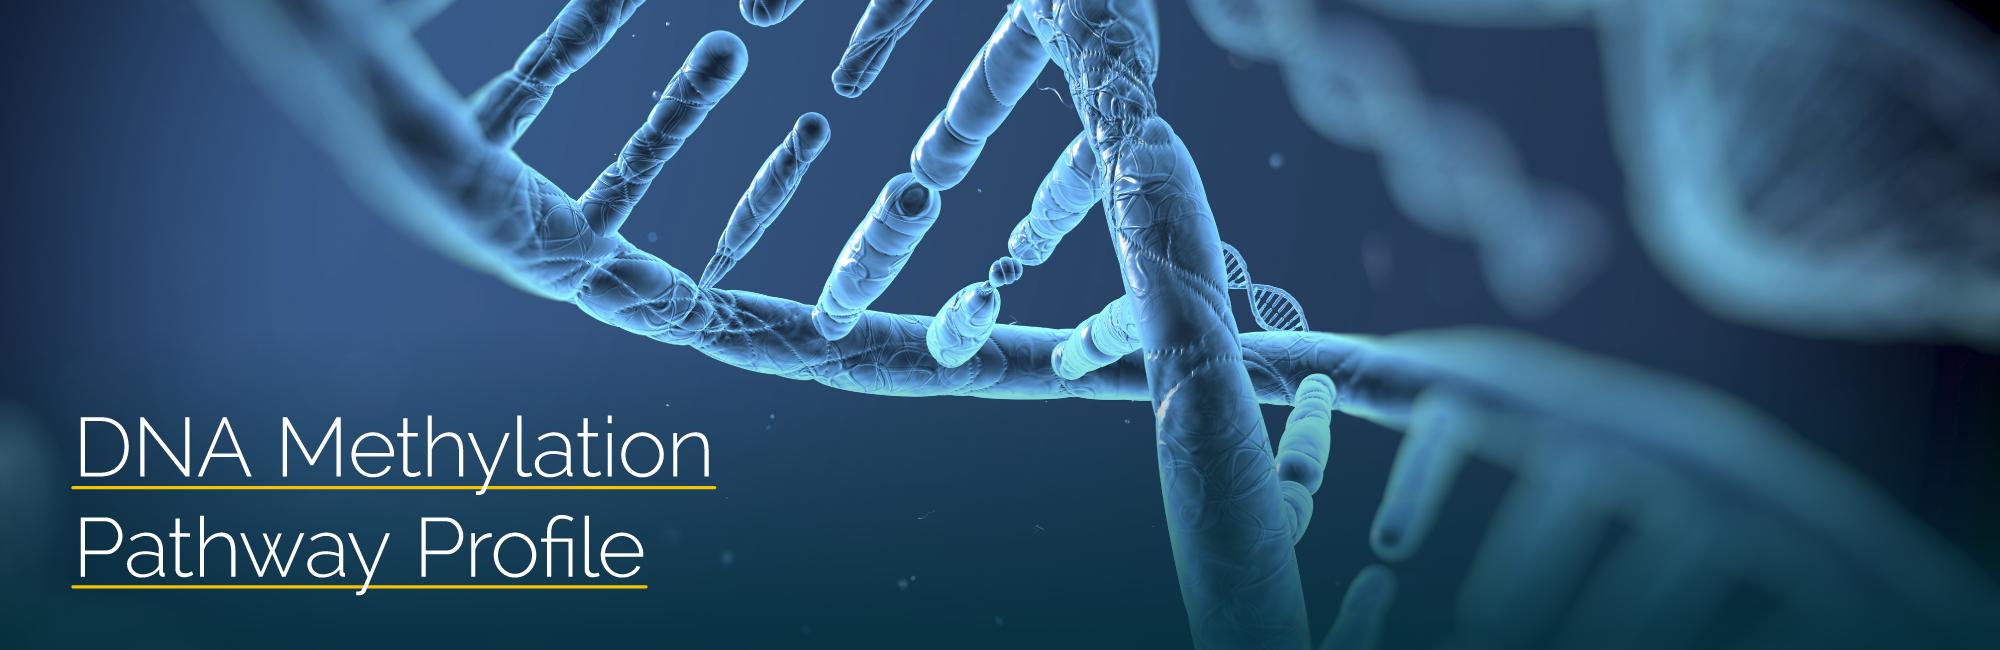 GLP_DNA_webpage-header.png